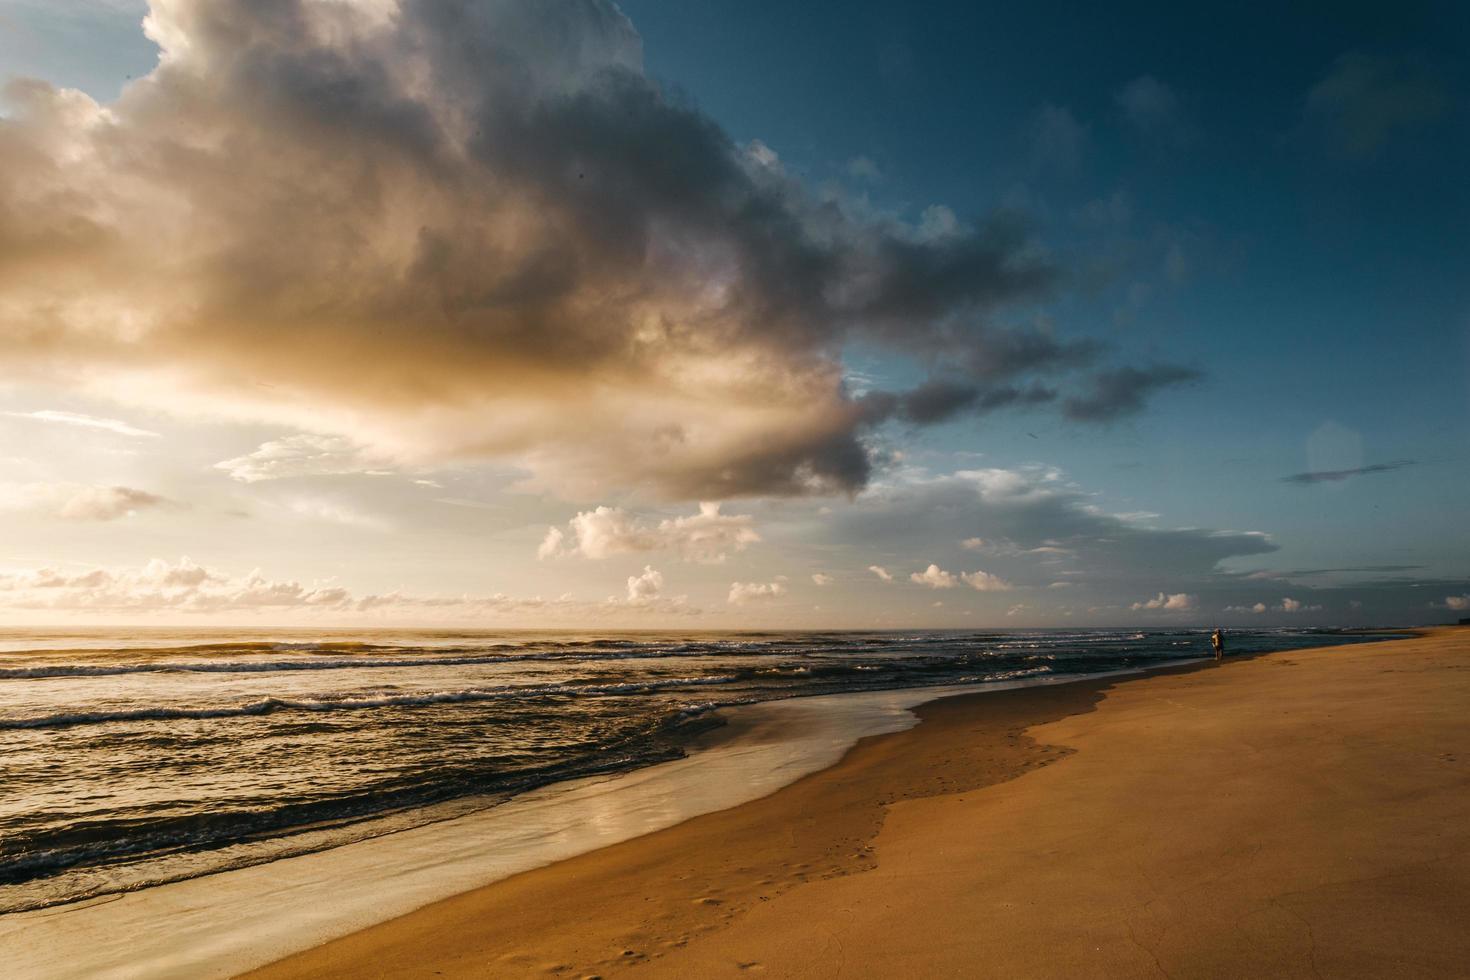 playa tranquila al atardecer foto